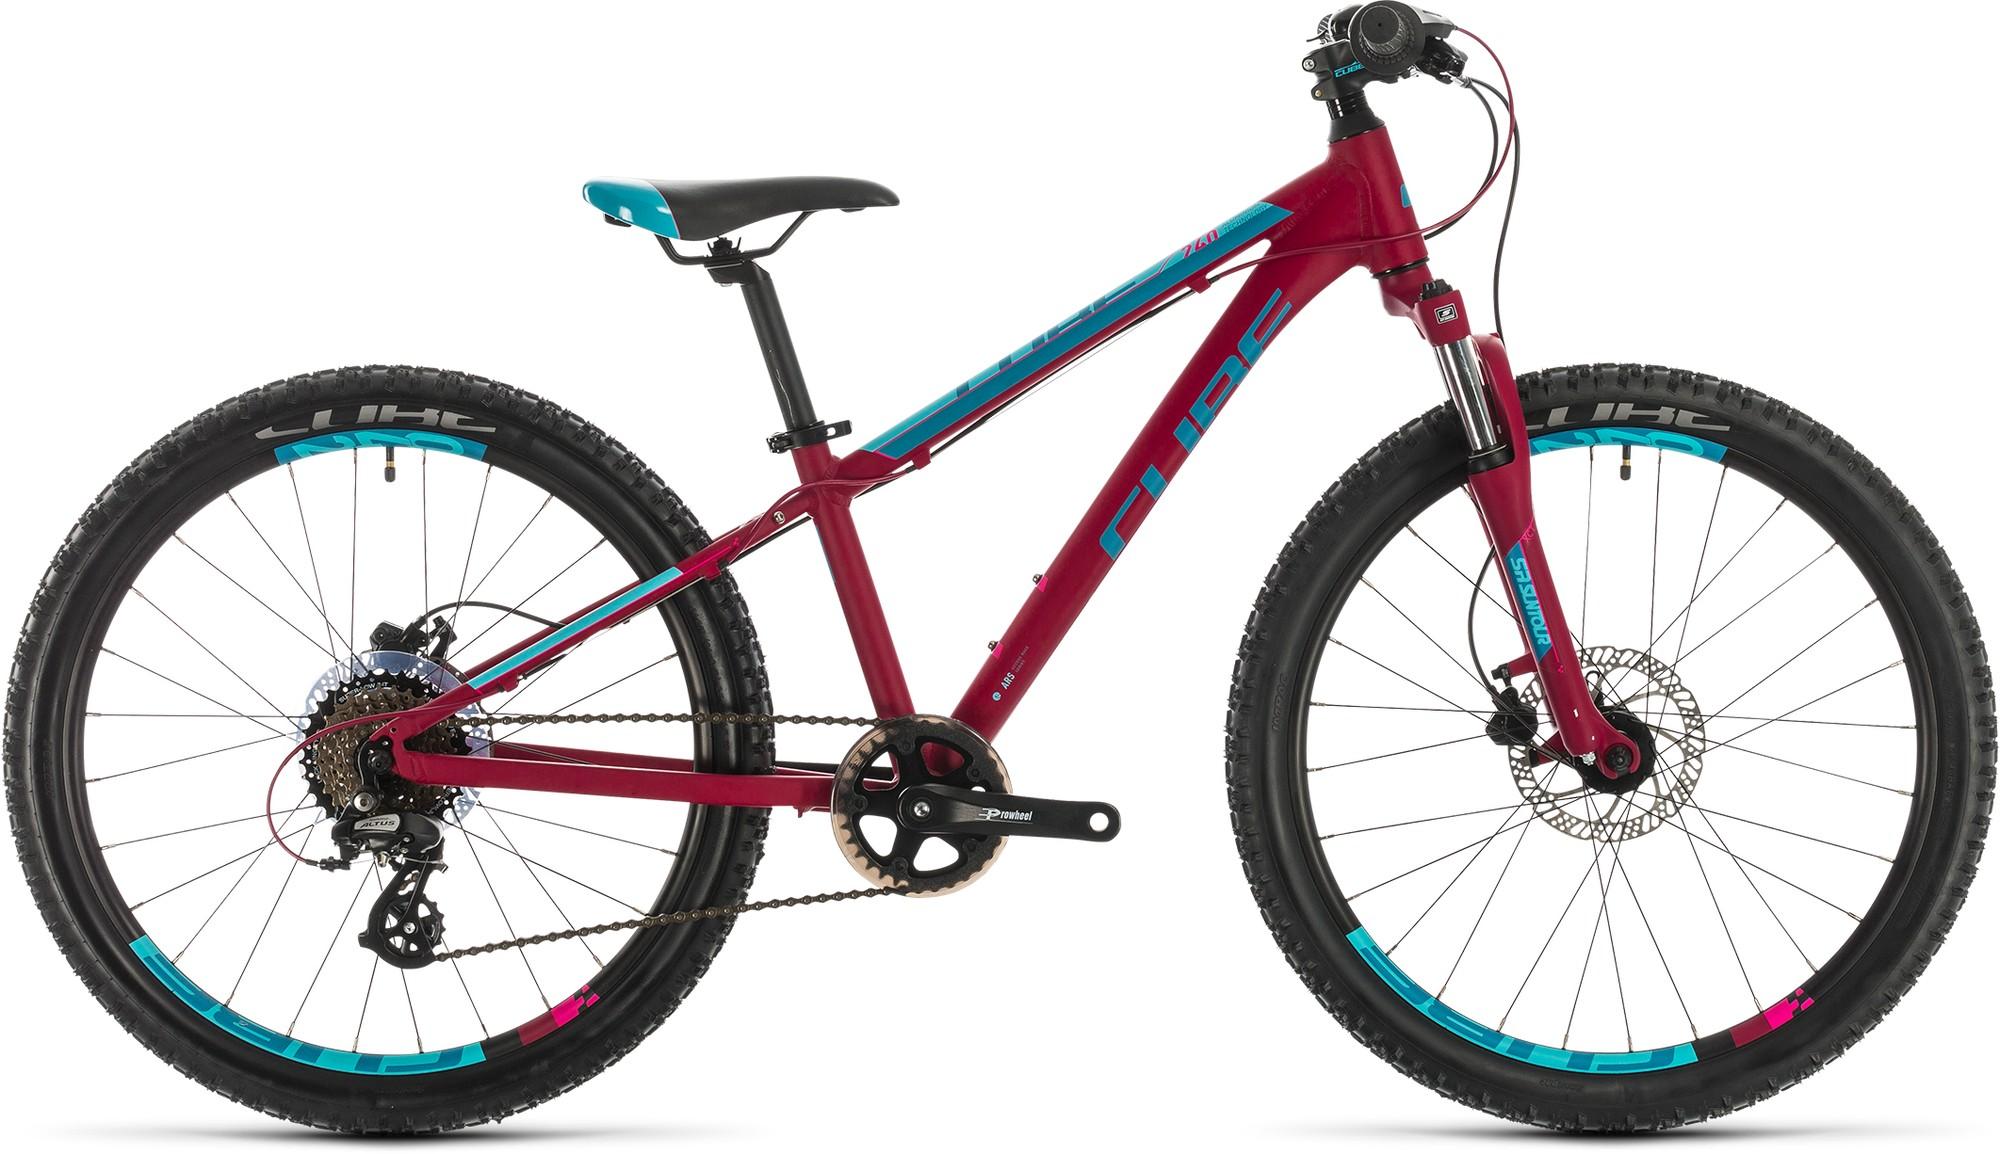 Cube Велосипед подростковый CUBE Access 240 велосипед cube hyde 2018